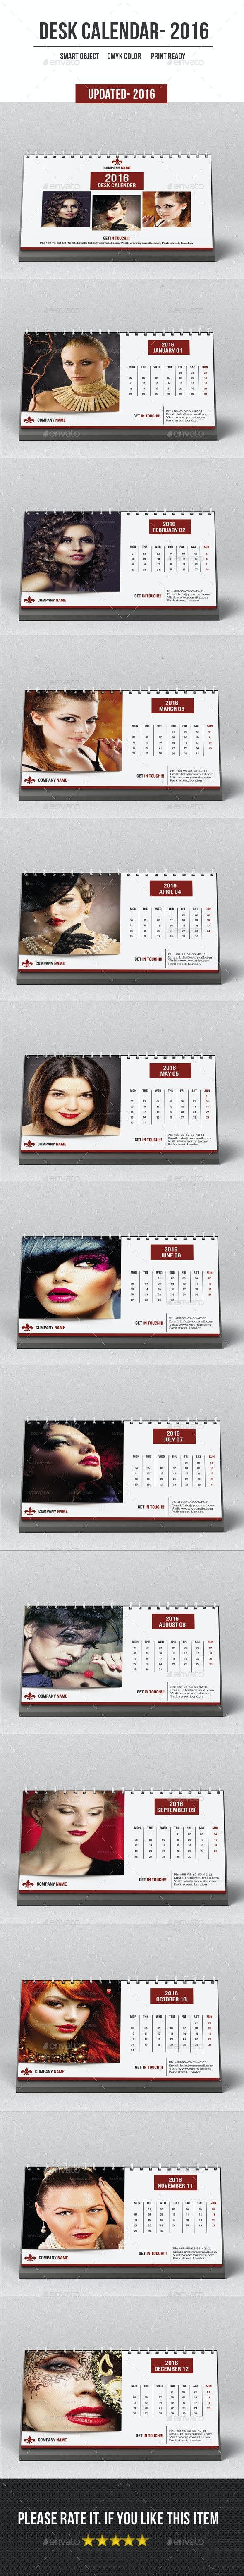 Desk Calender For 2016 - Calendars Stationery